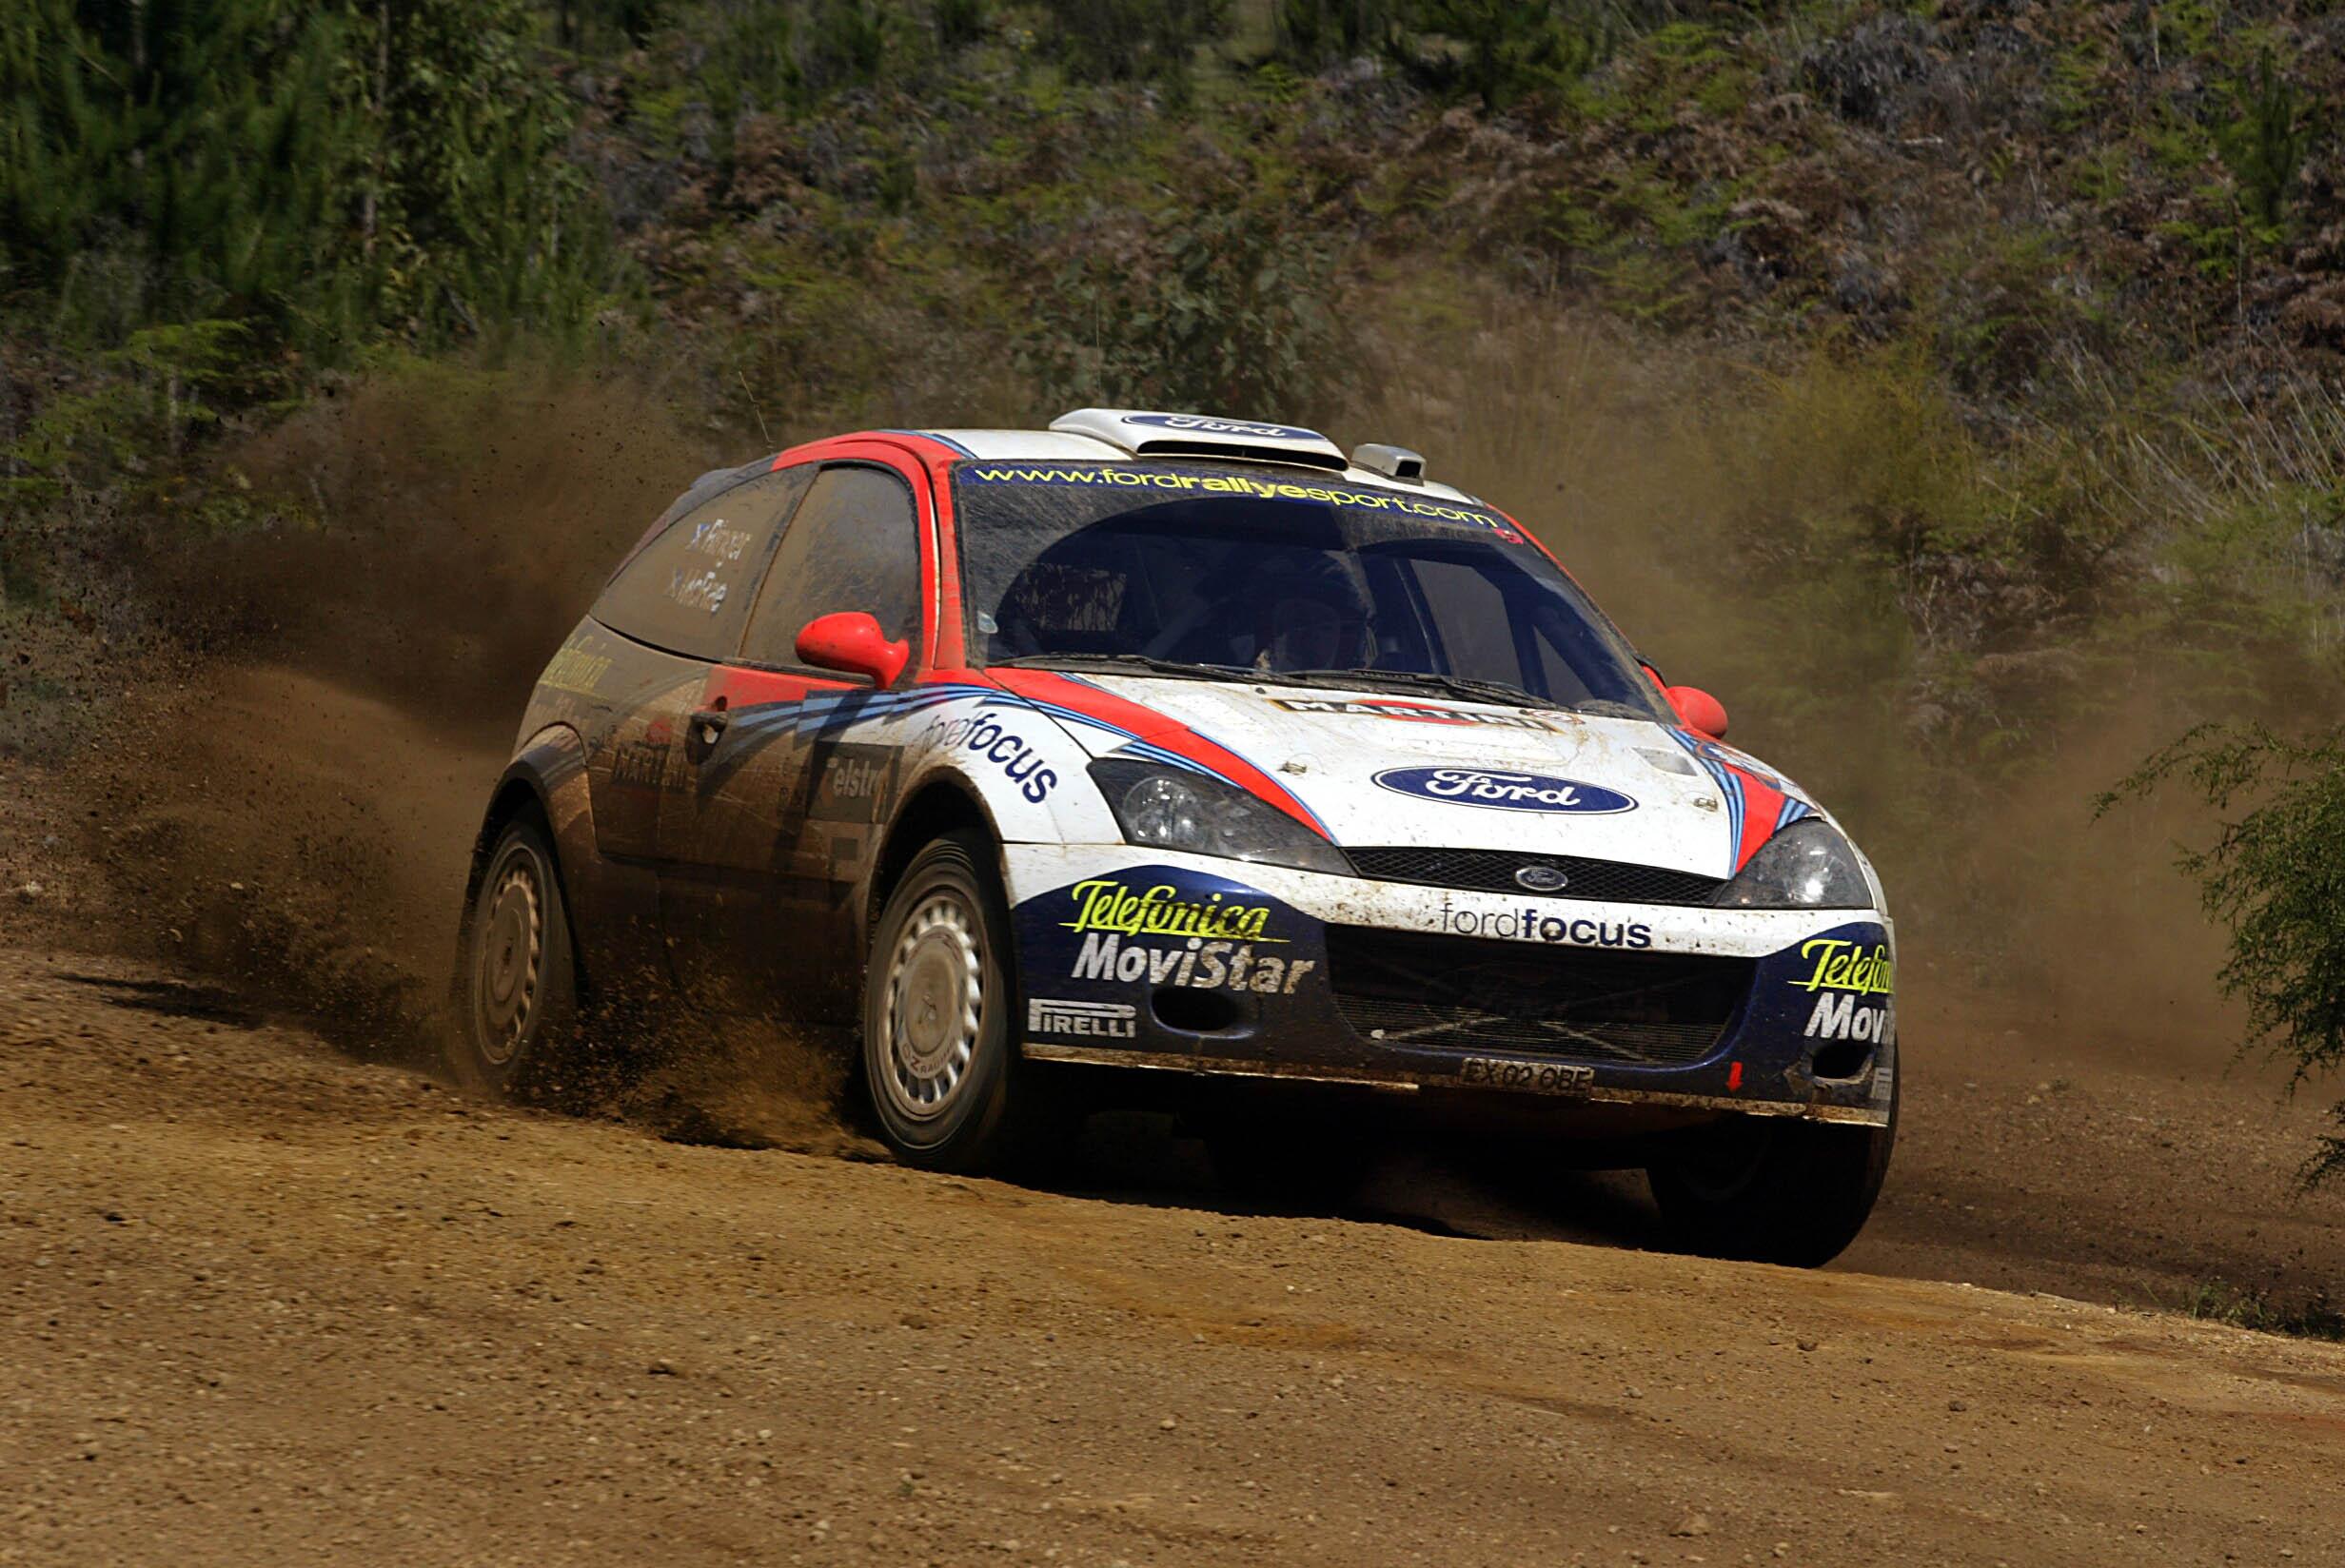 Colin_McRae_Focus_WRC_Rally_Australia.jpg